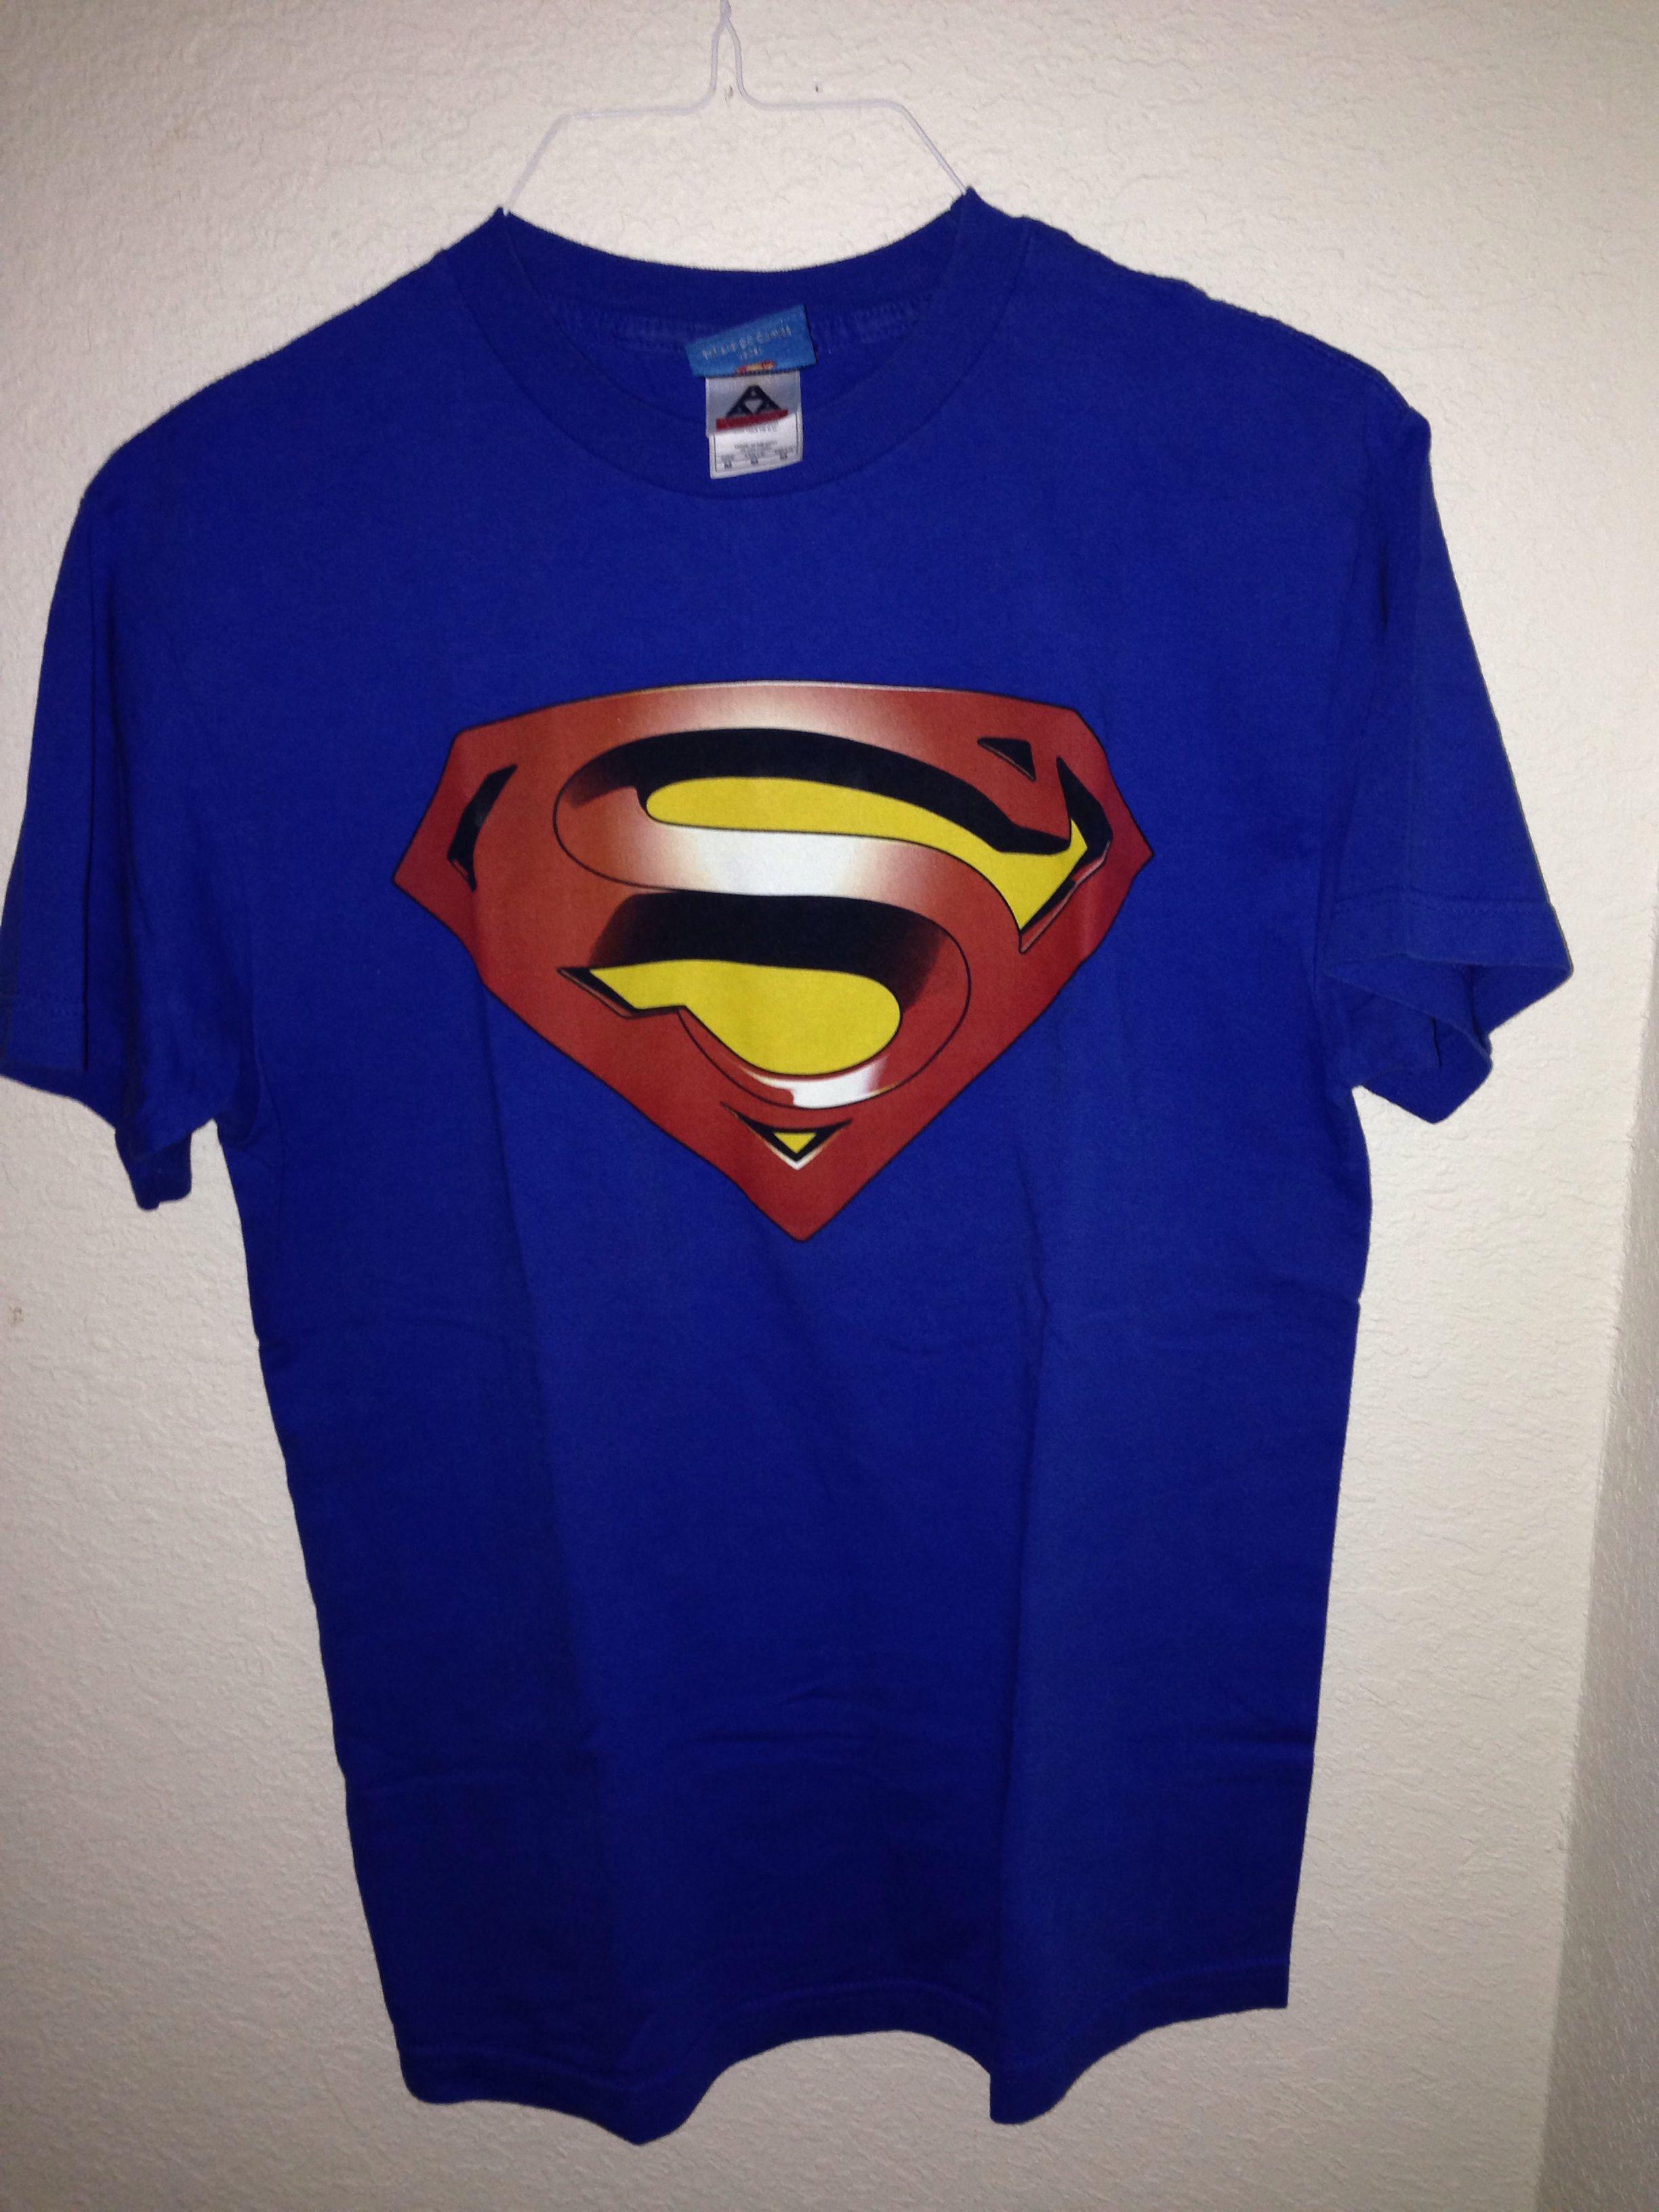 62a375f2188a7 Superman Tshirt- Superman Returns